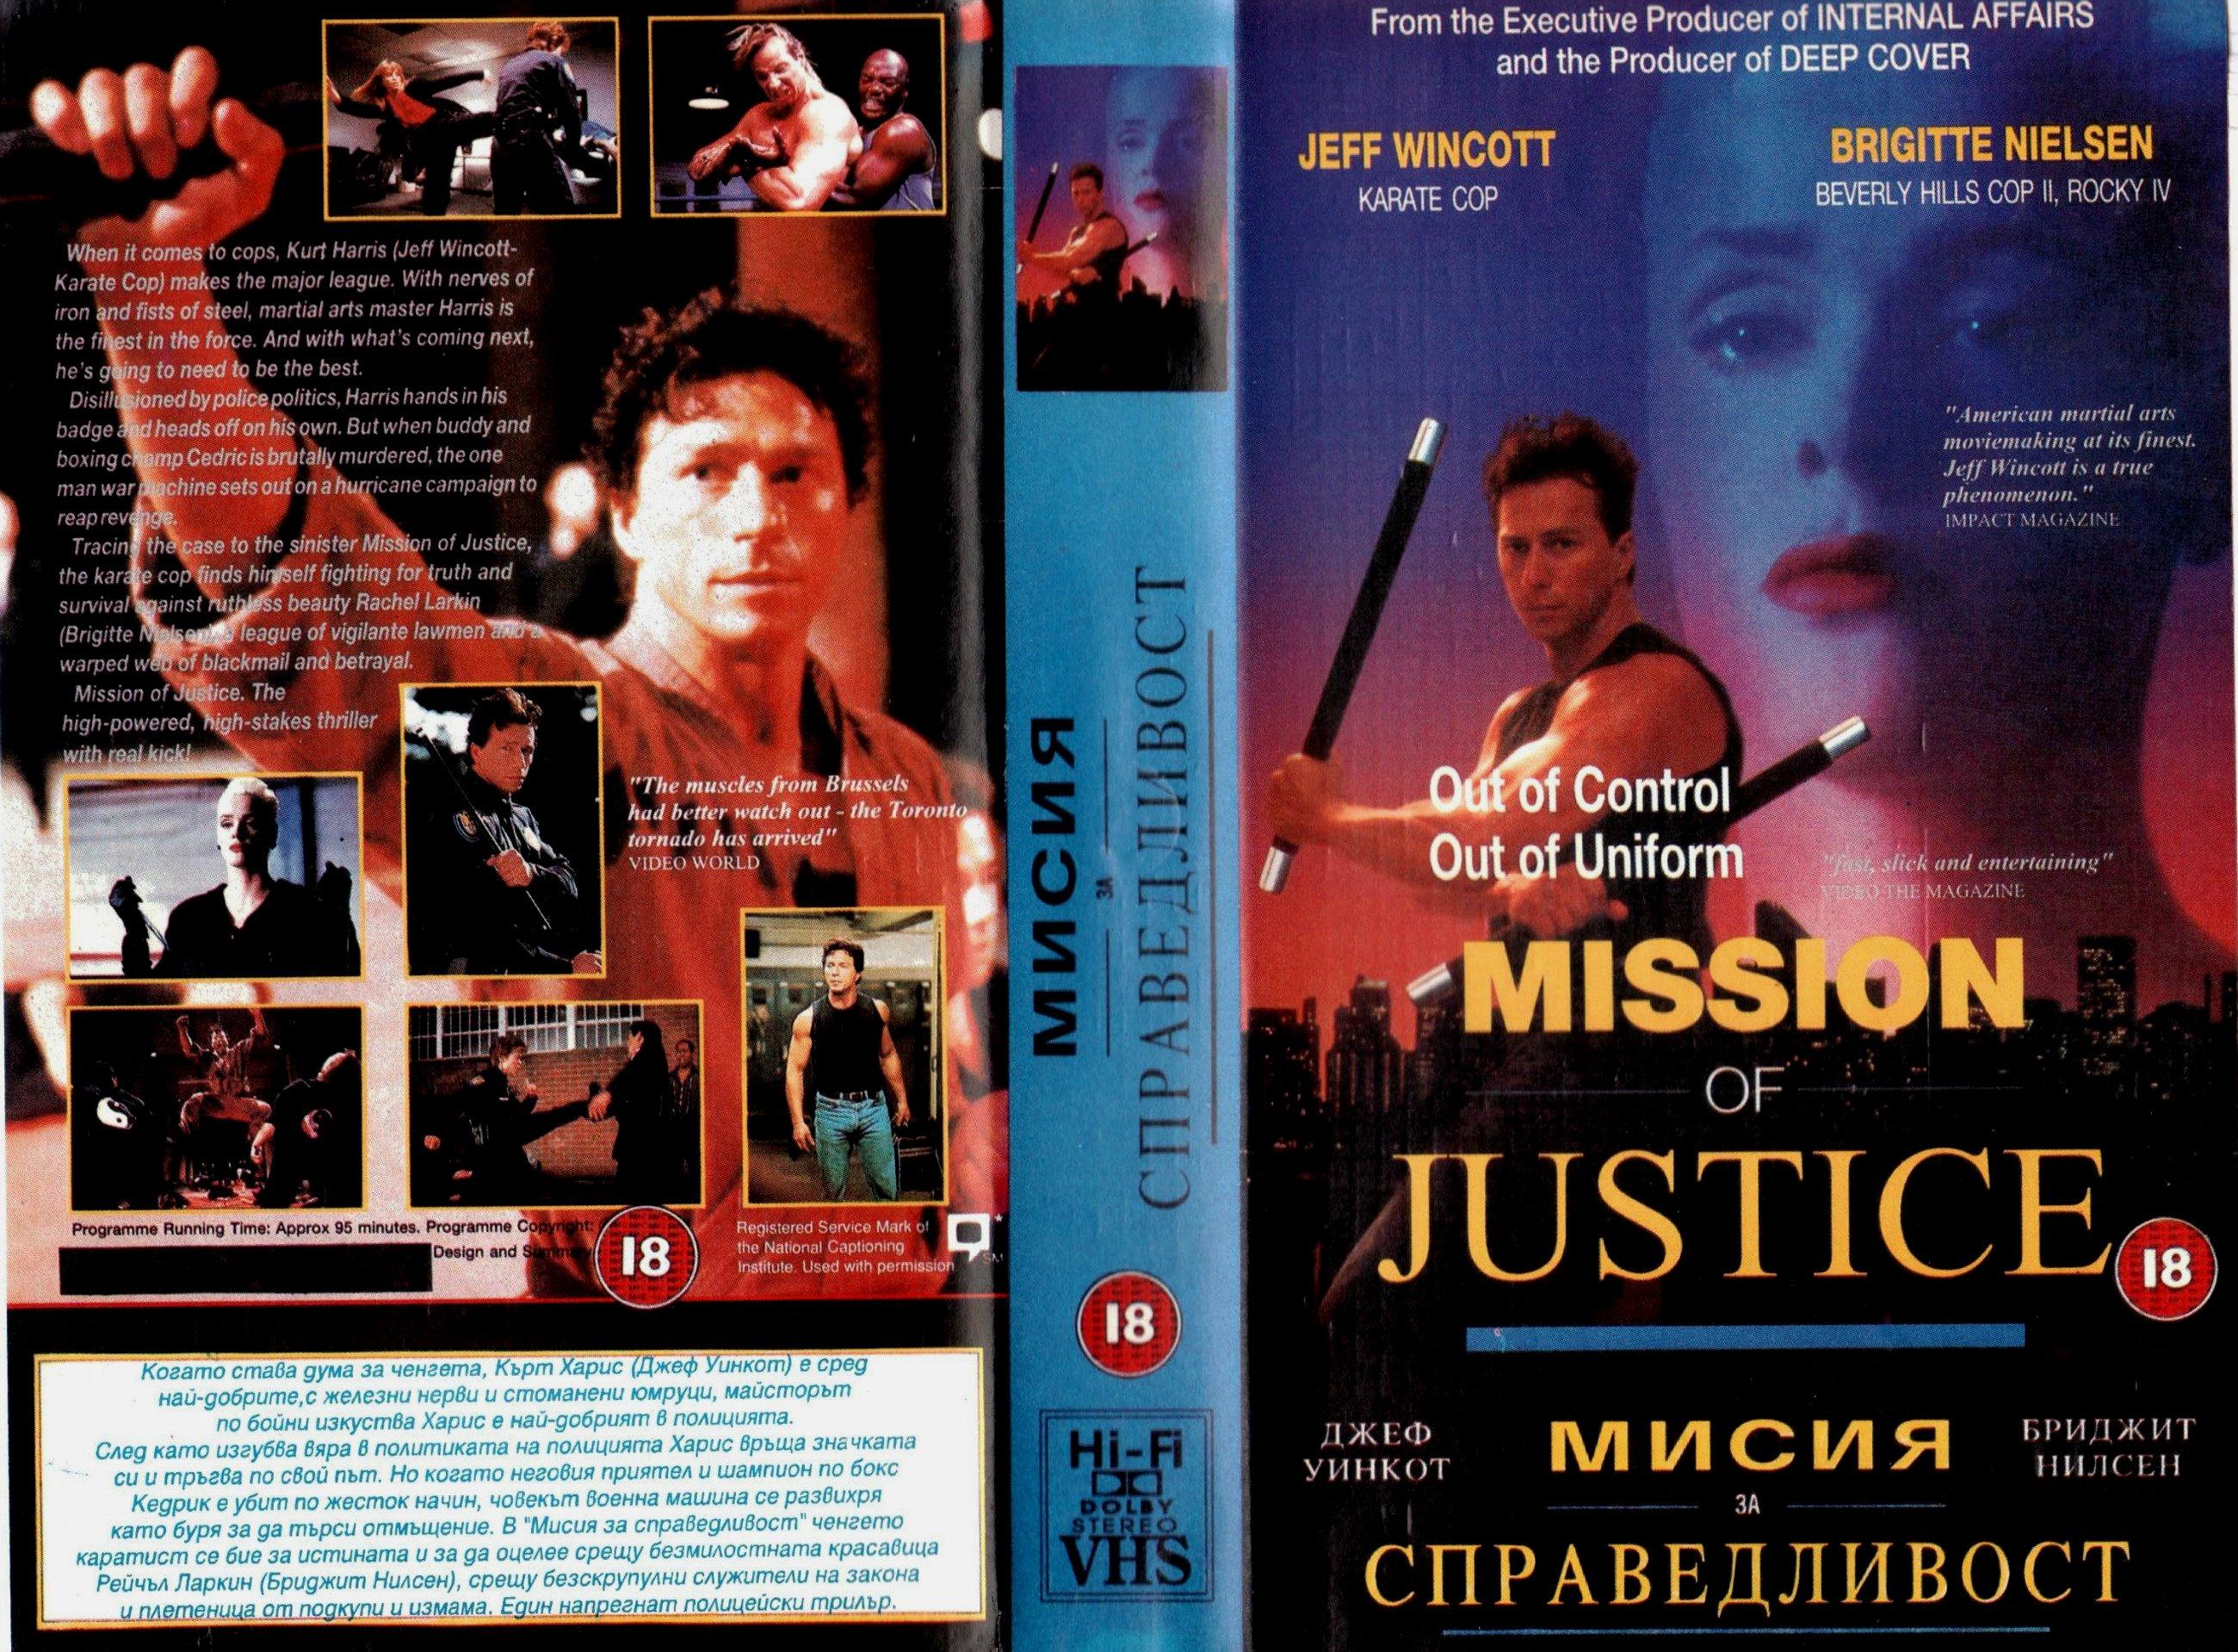 Мисия за справедливост джеф уинкот